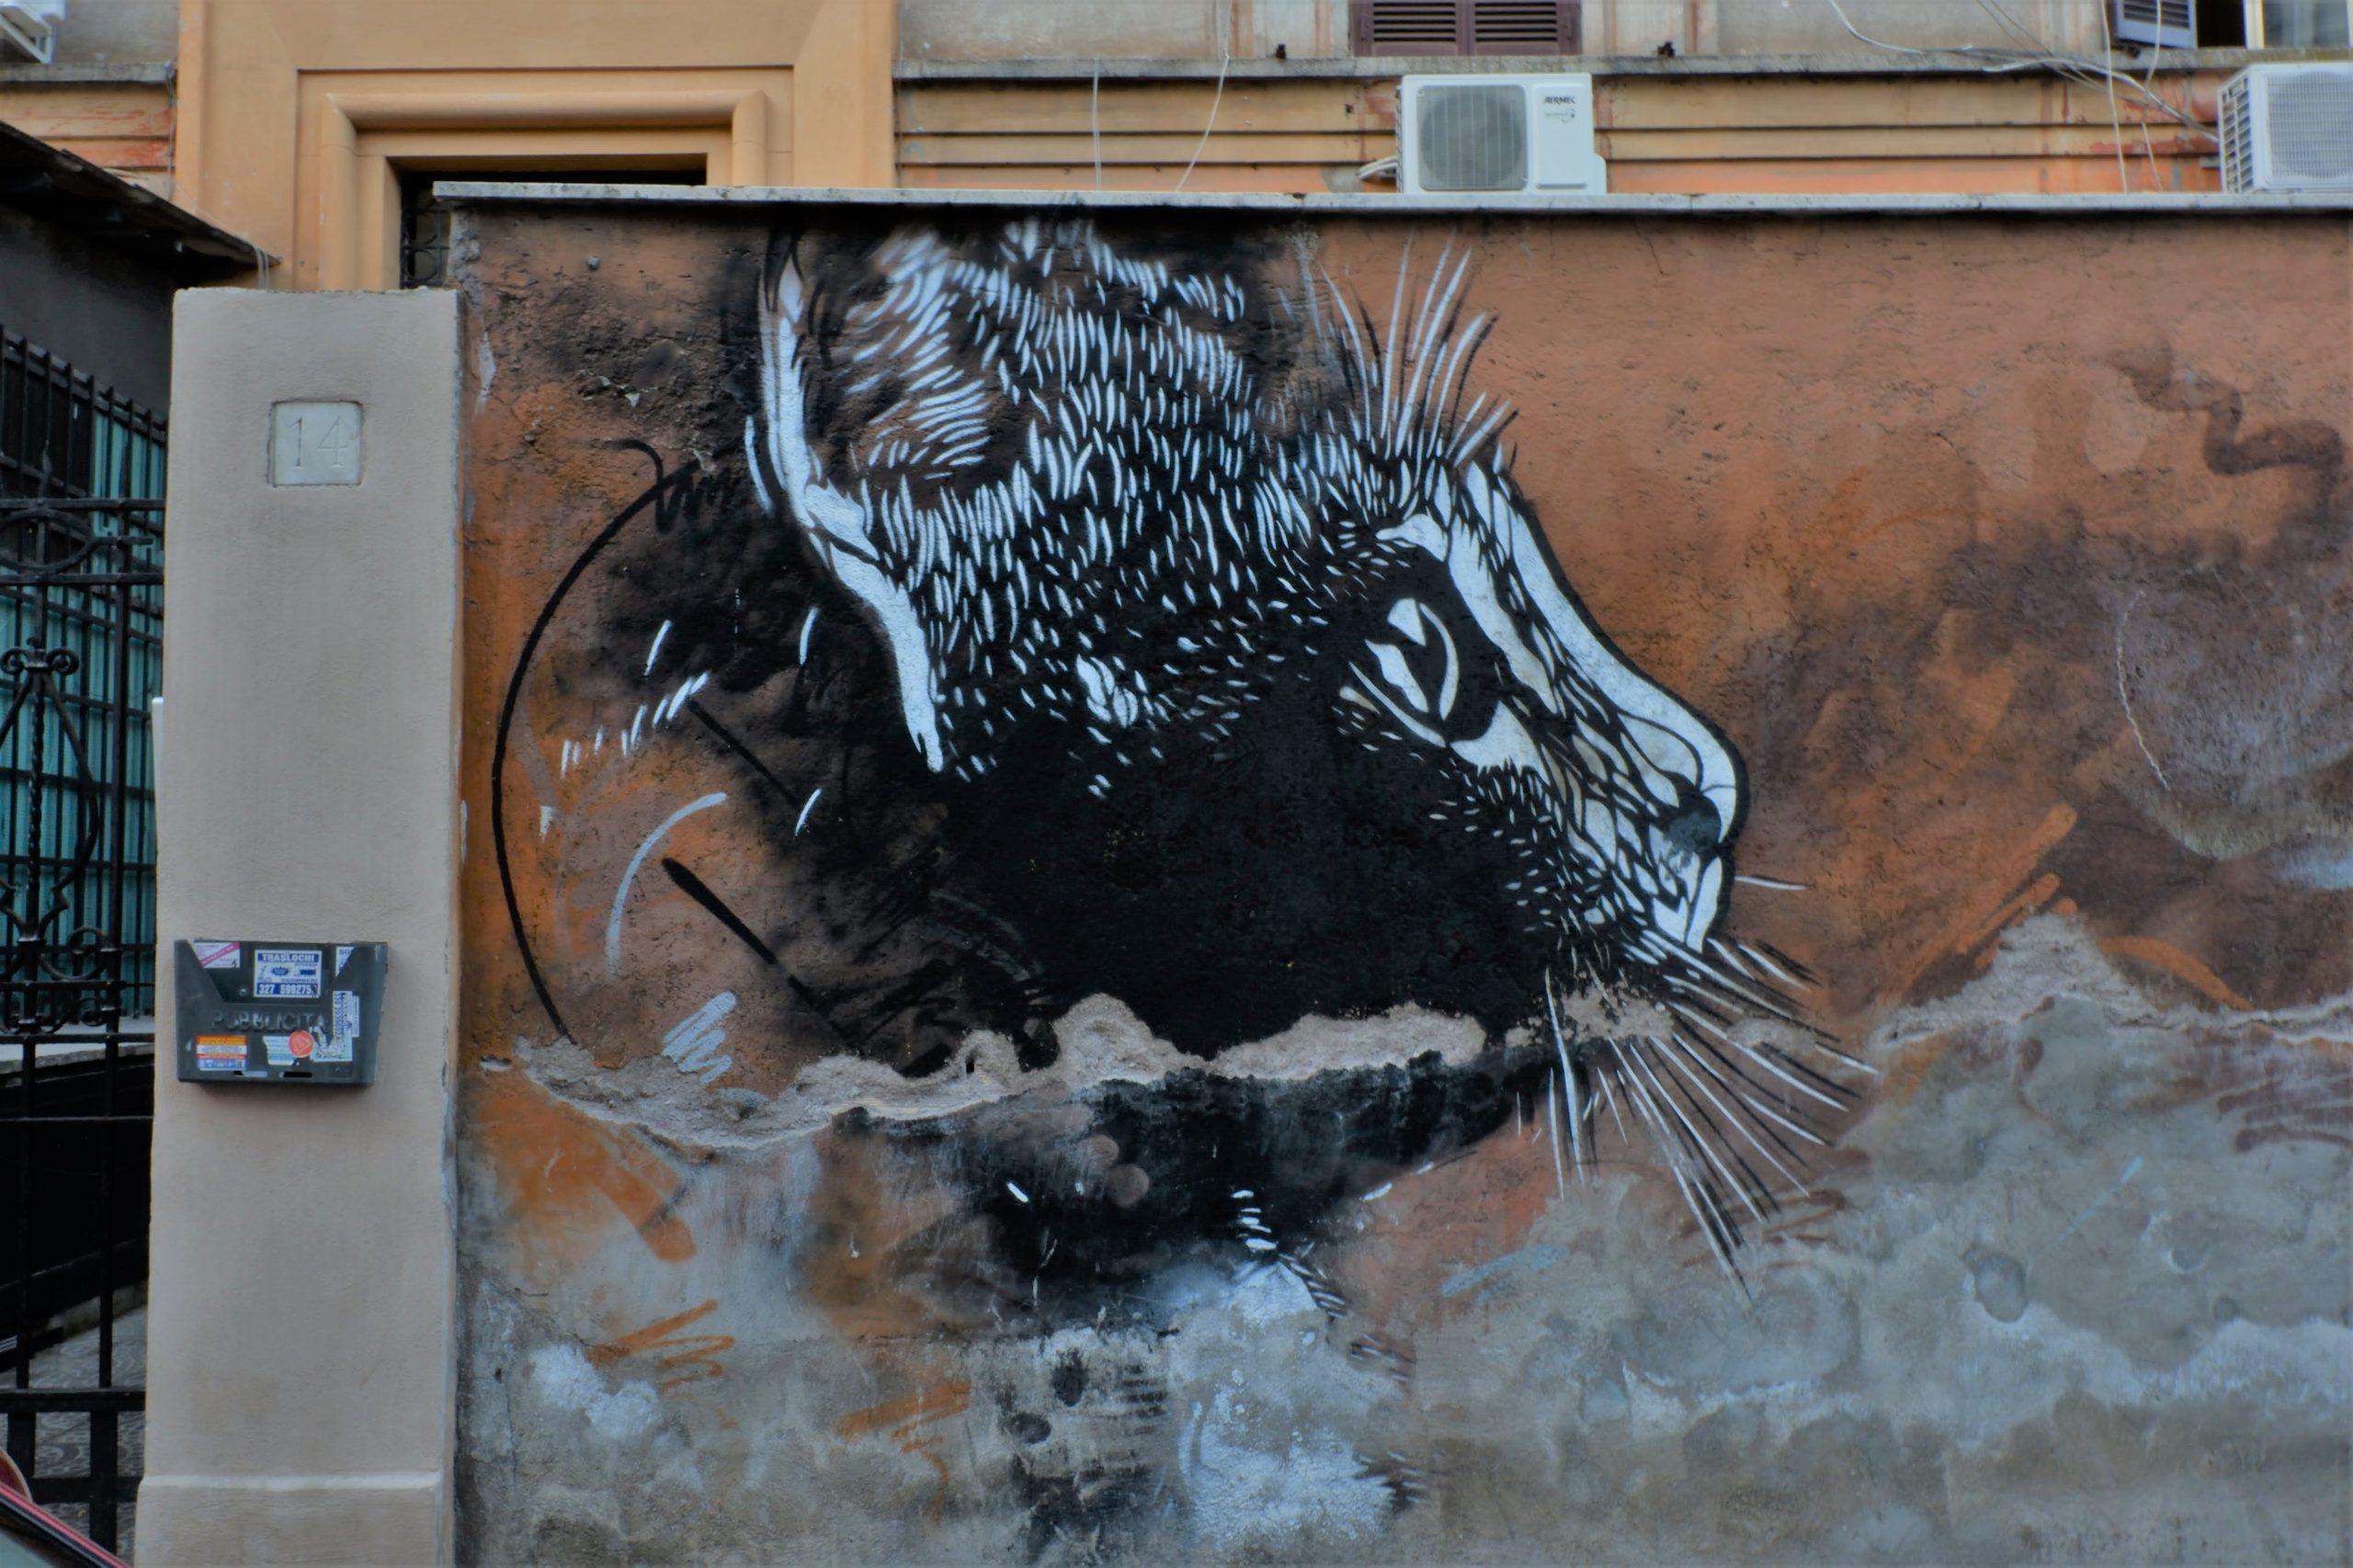 c215 tor pignattara roma street art